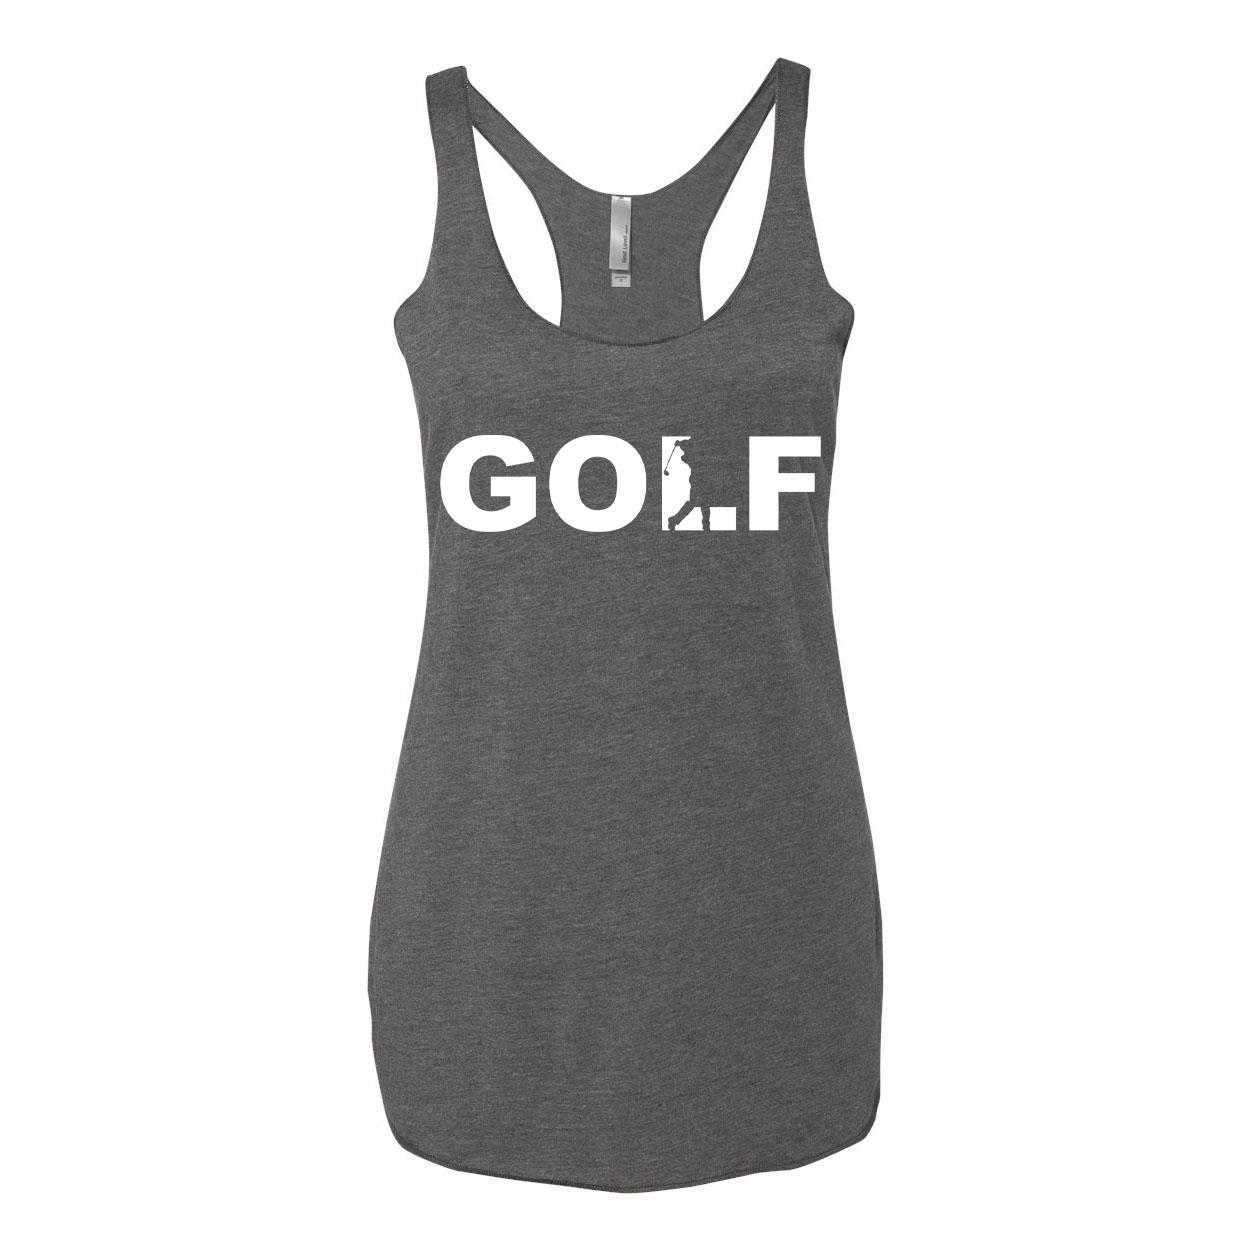 Golf Swing Logo Classic Women's Ultra Thin Tank Top Premium Heather Gray (White Logo)